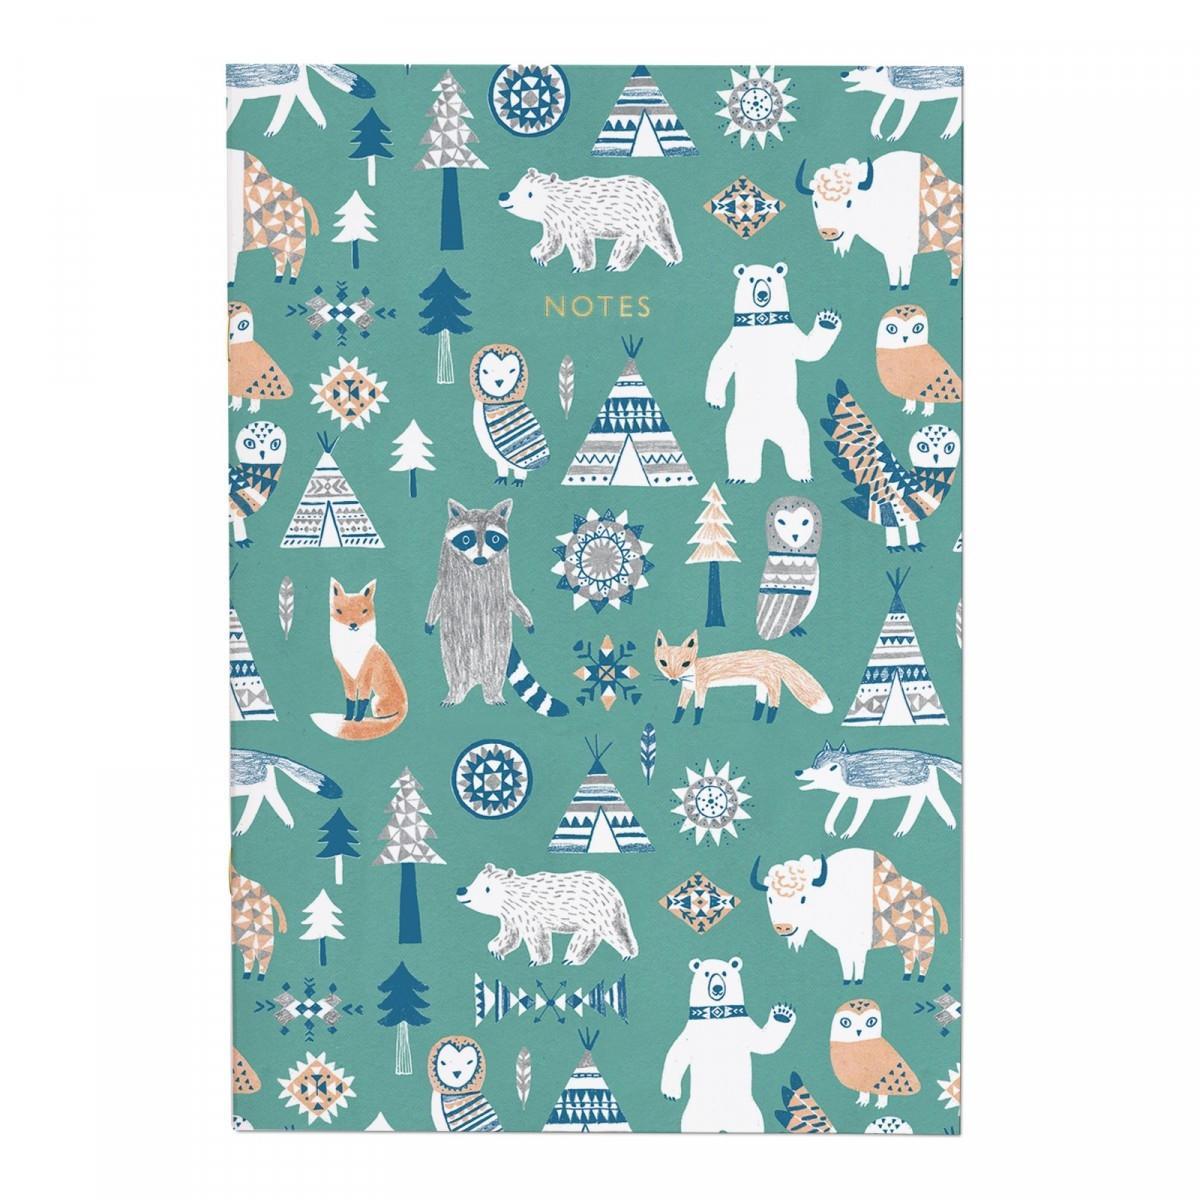 Ohh Deer Linkovaný sešit Scandi Woodland, zelená barva, multi barva, papír